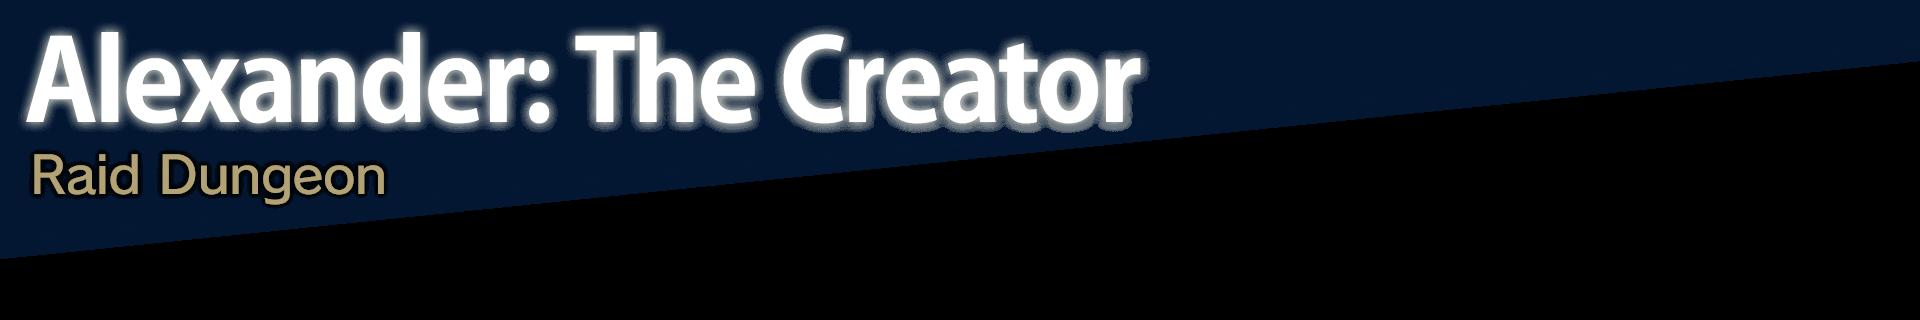 Alexander: The Creator